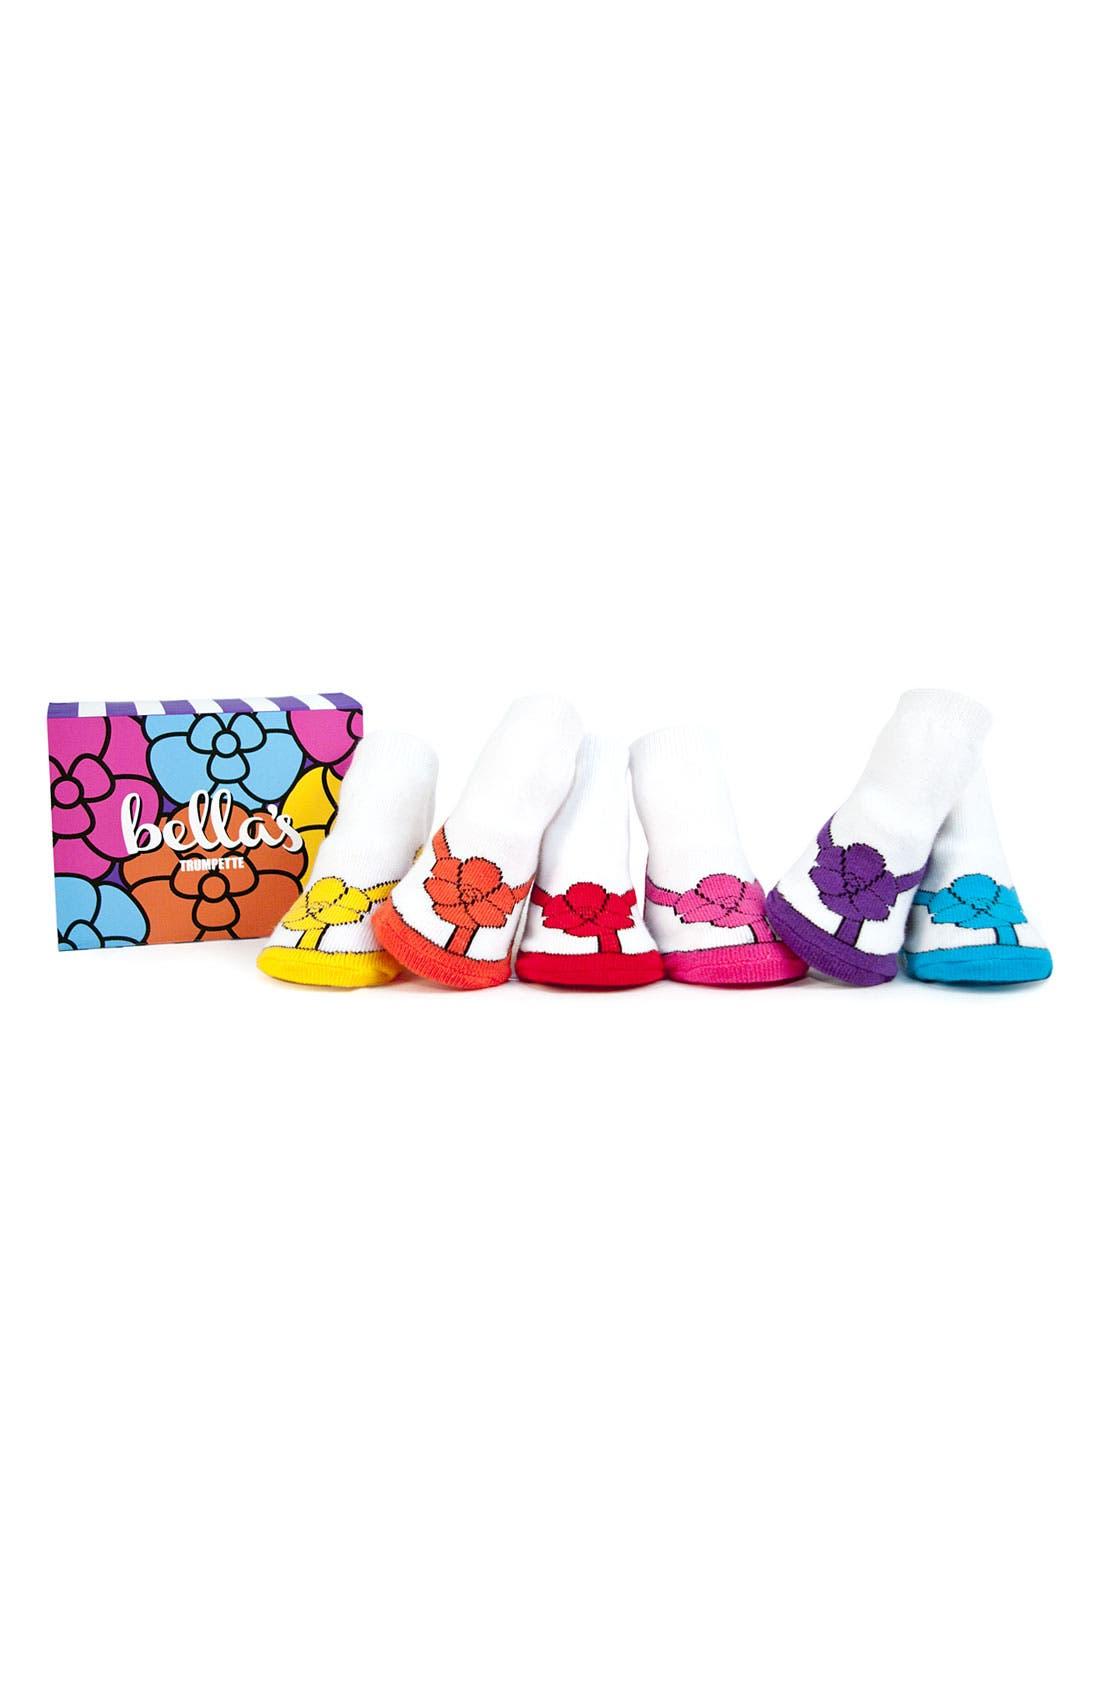 Main Image - Trumpette 'Bella's' Socks Gift Set (Baby Girls)